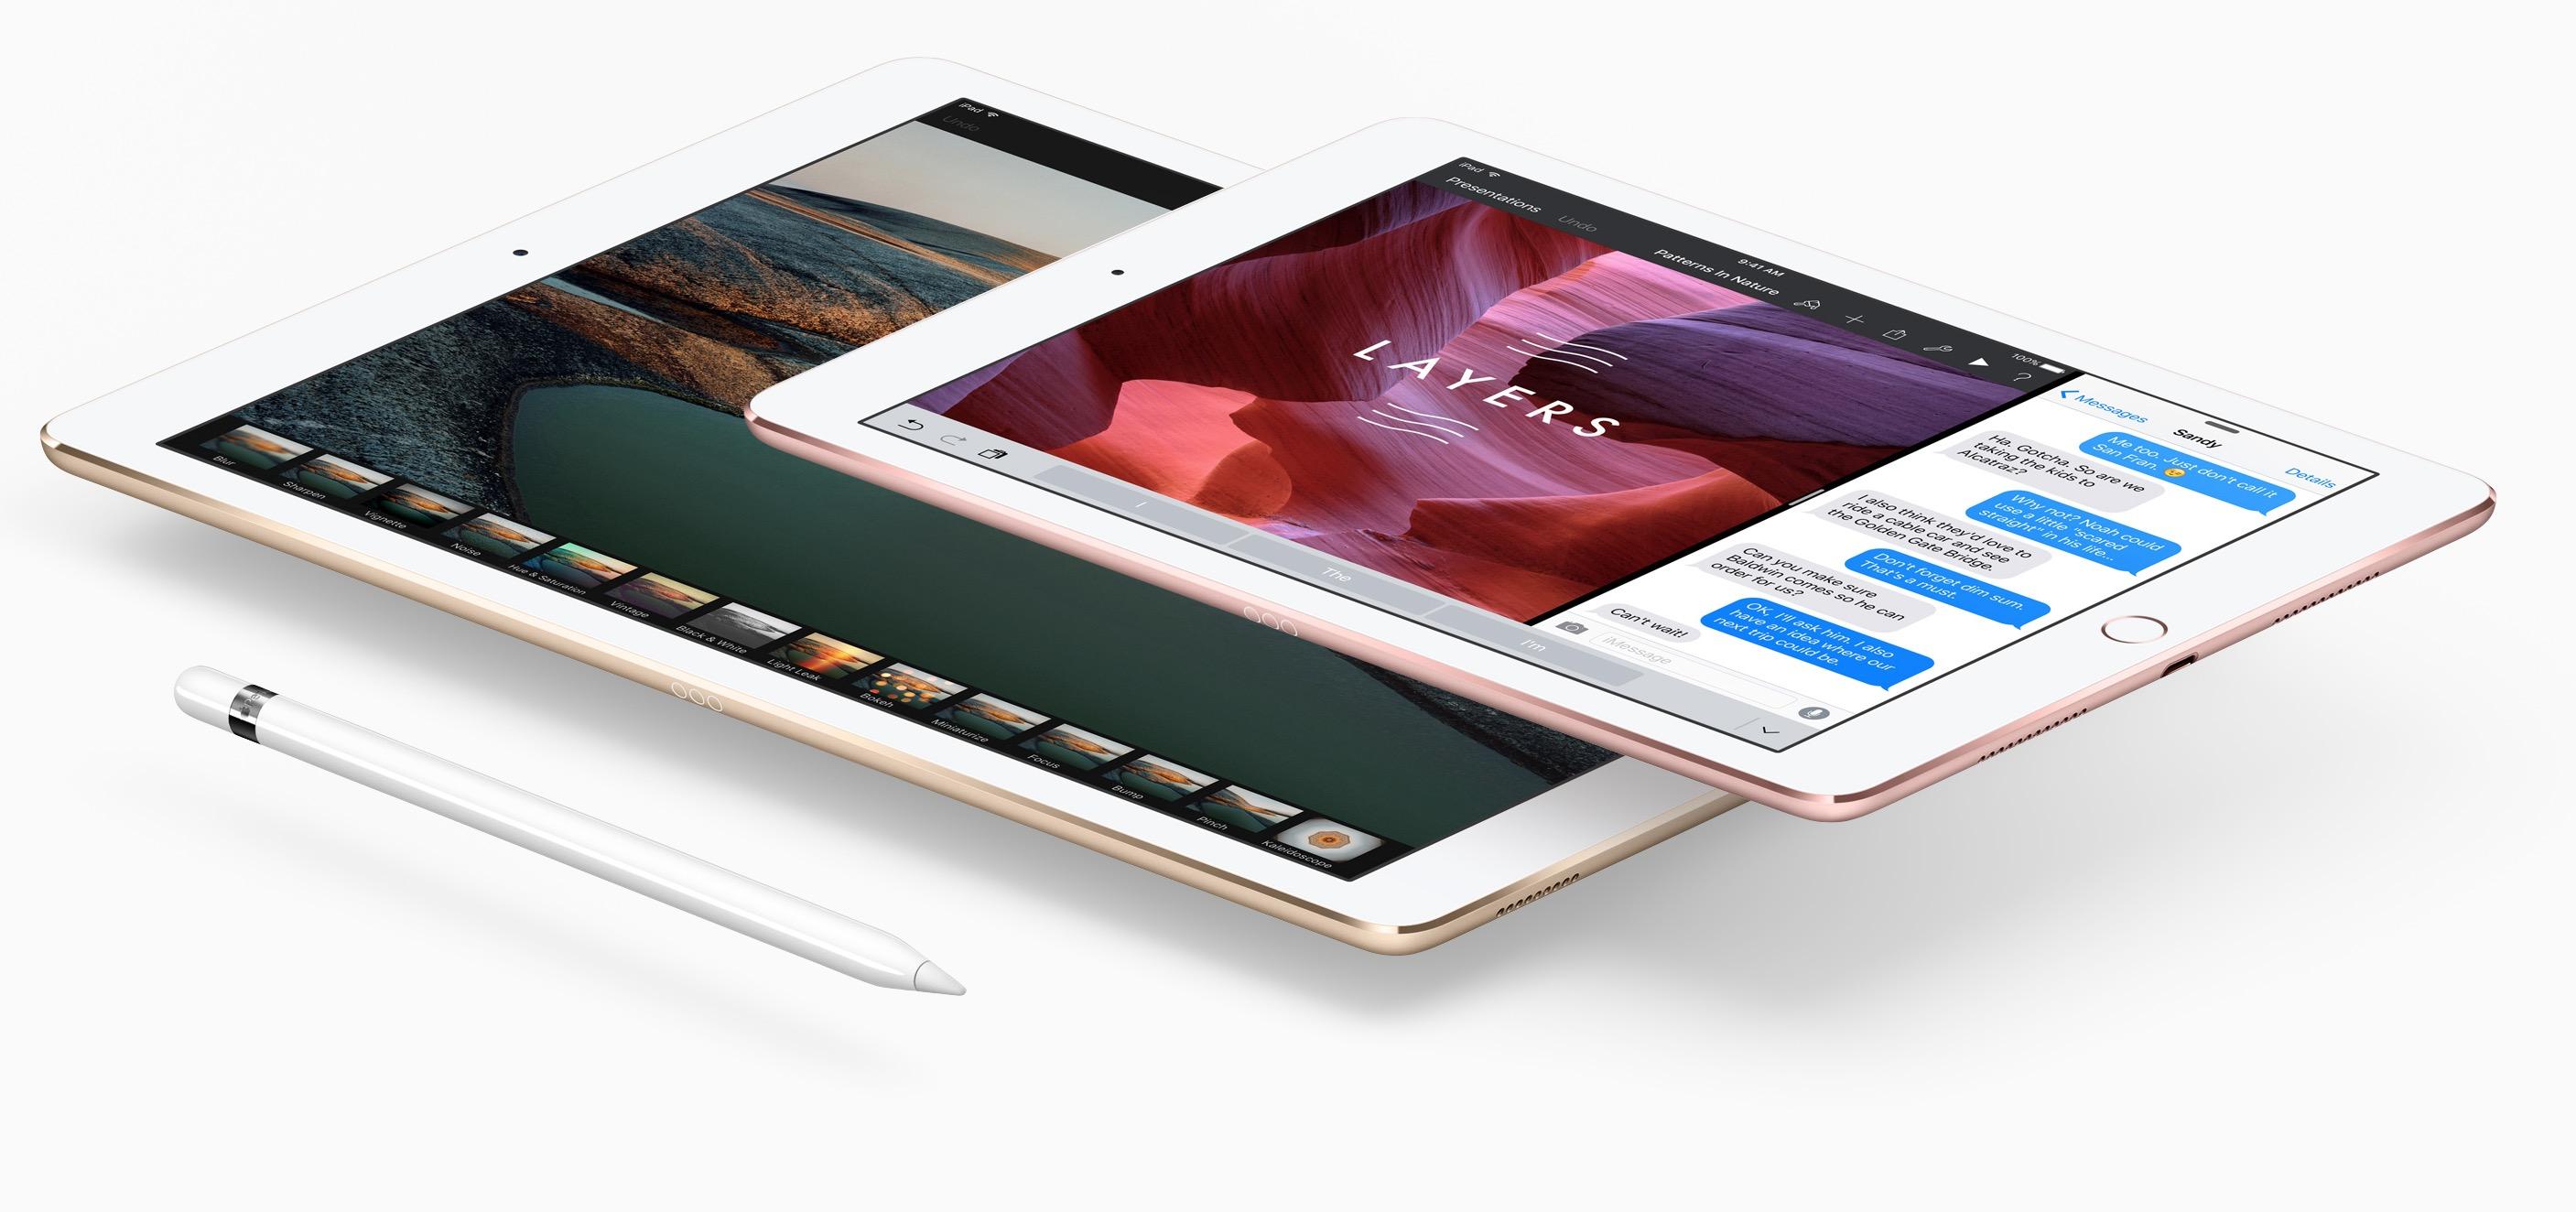 Both iPad Pro